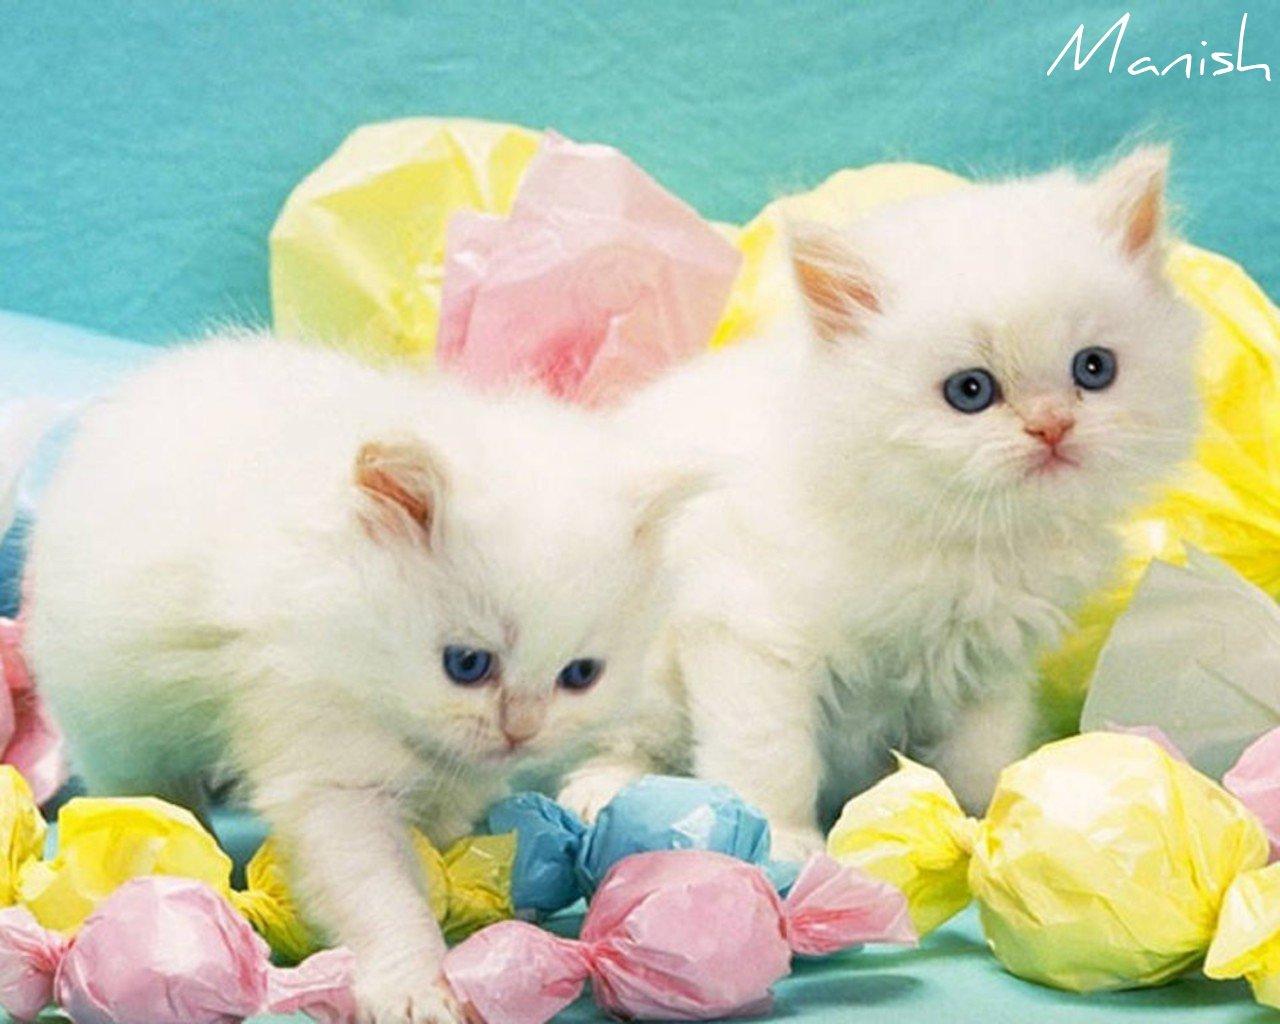 Kittens wallpaper kitten wallpaper - Cute kittens hd images ...